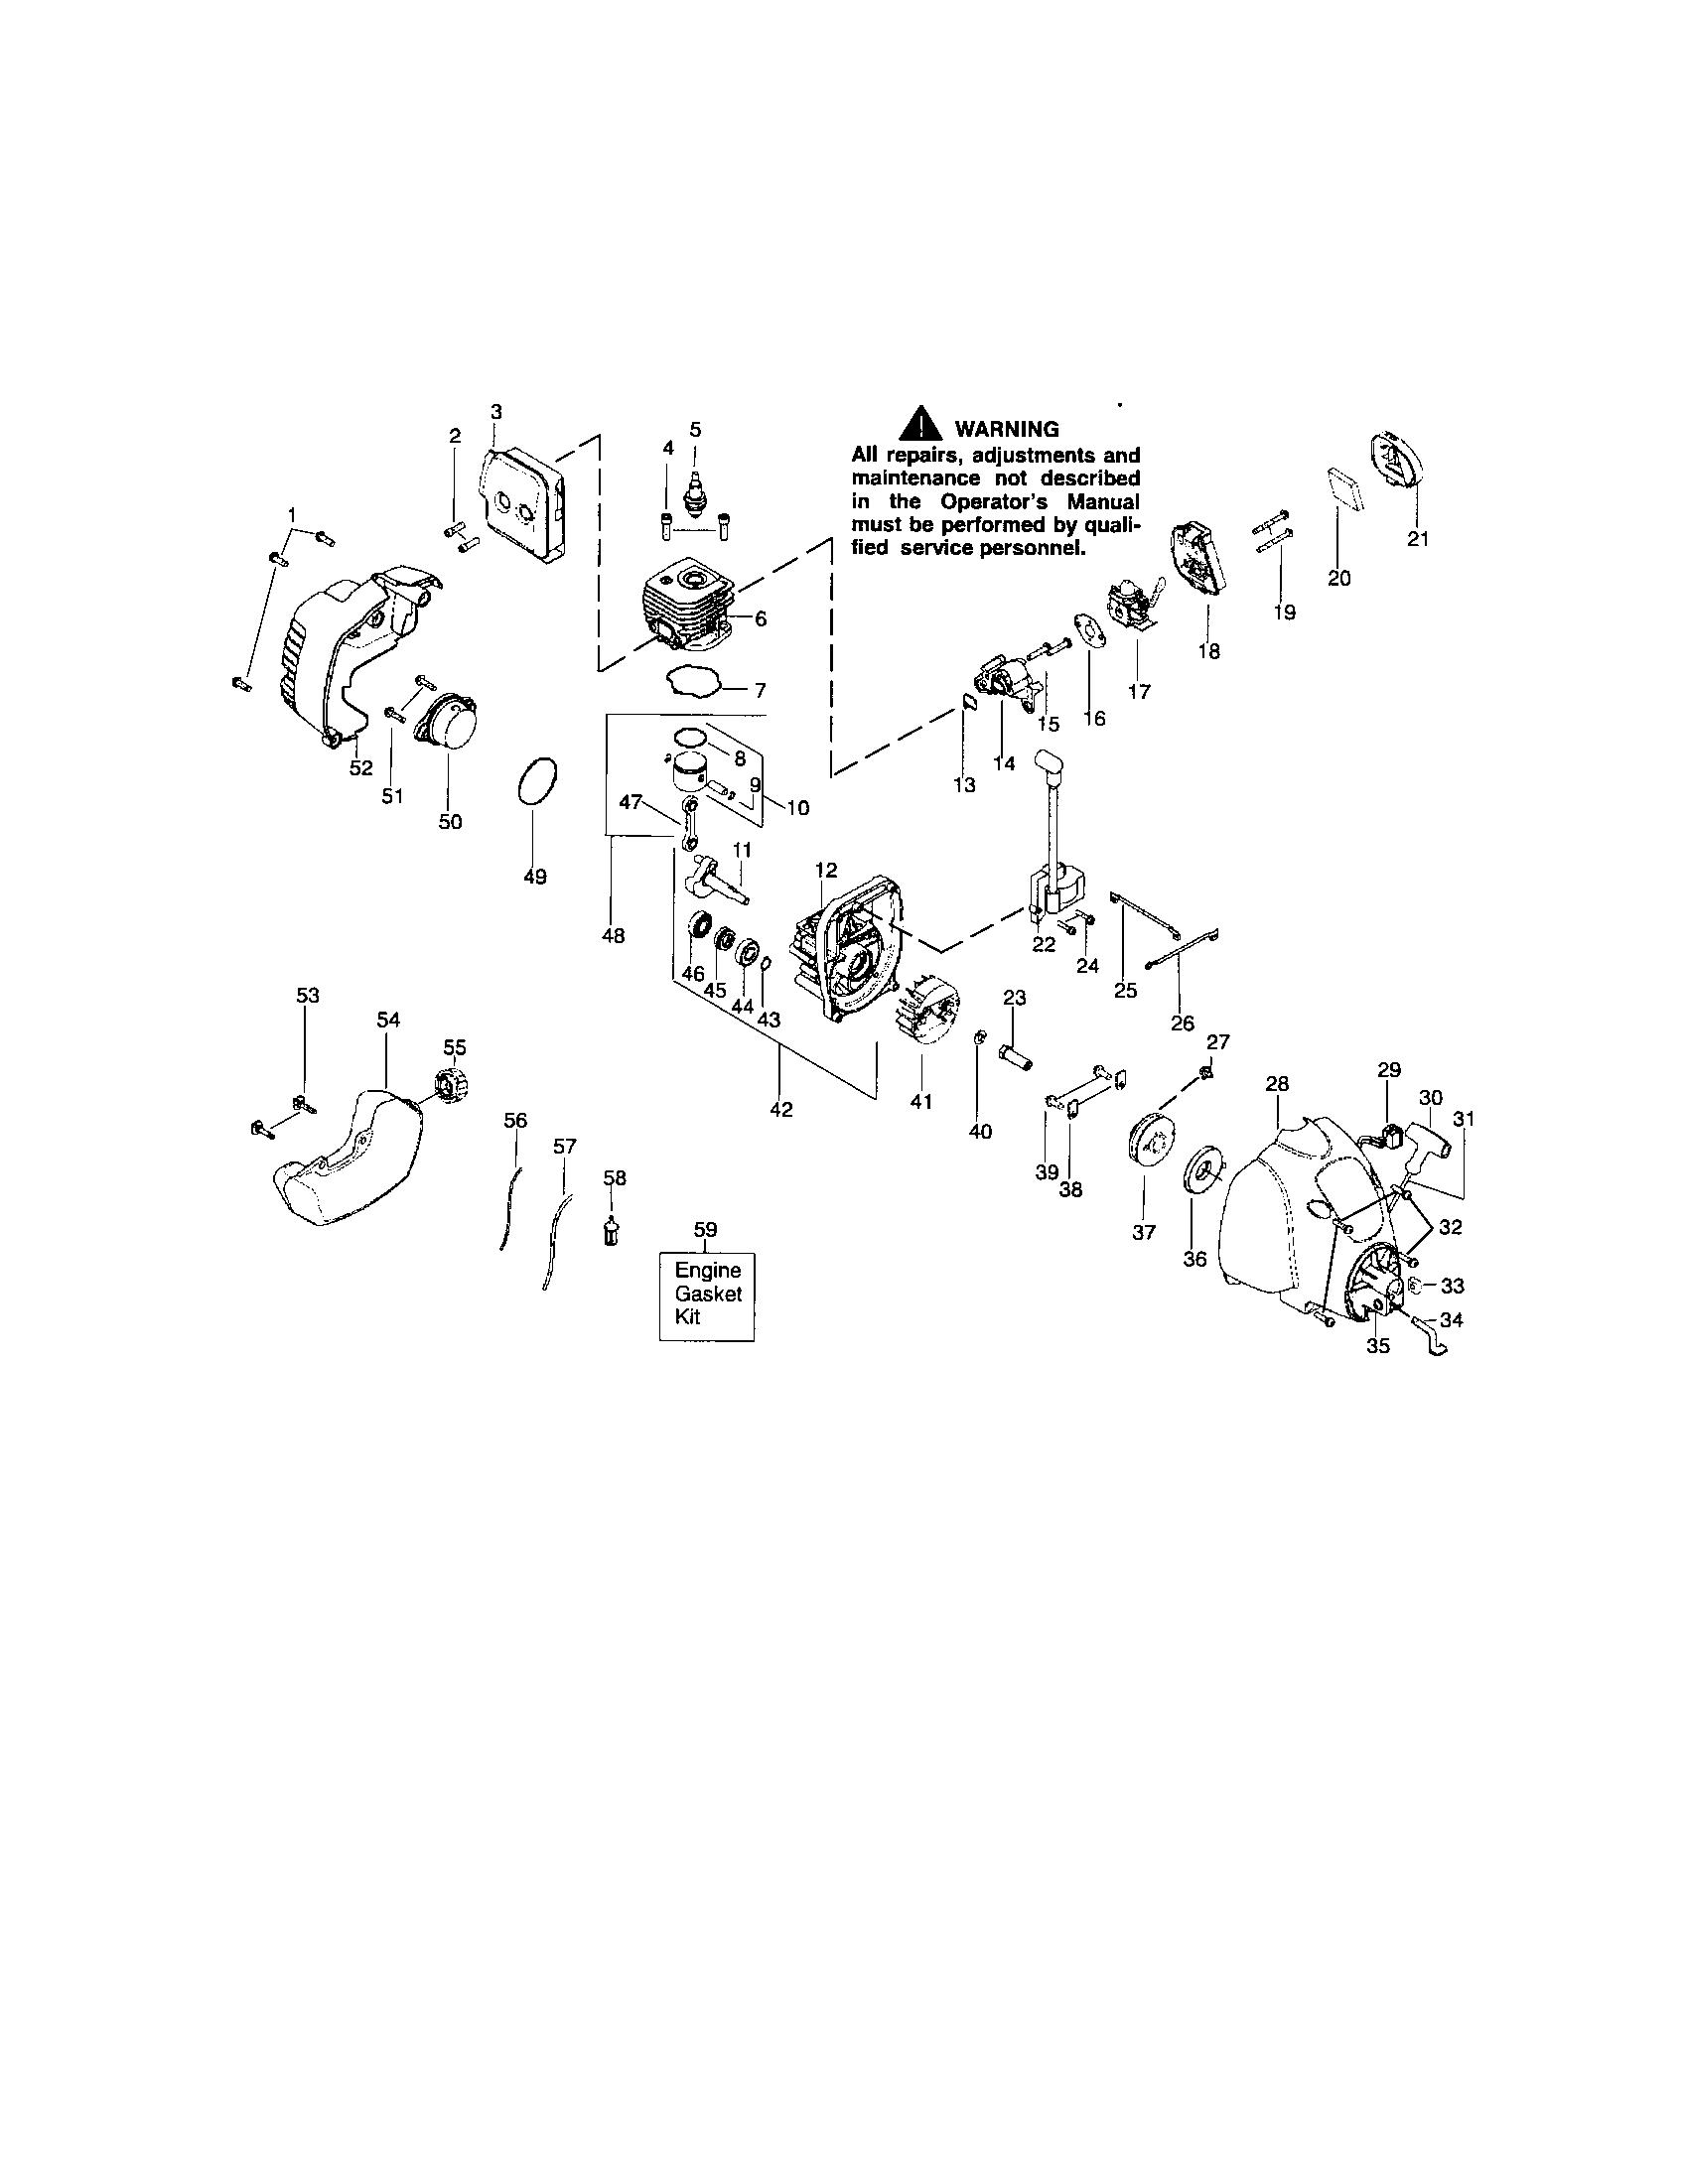 wiring diagram for a craftsman 32cc weedwacker